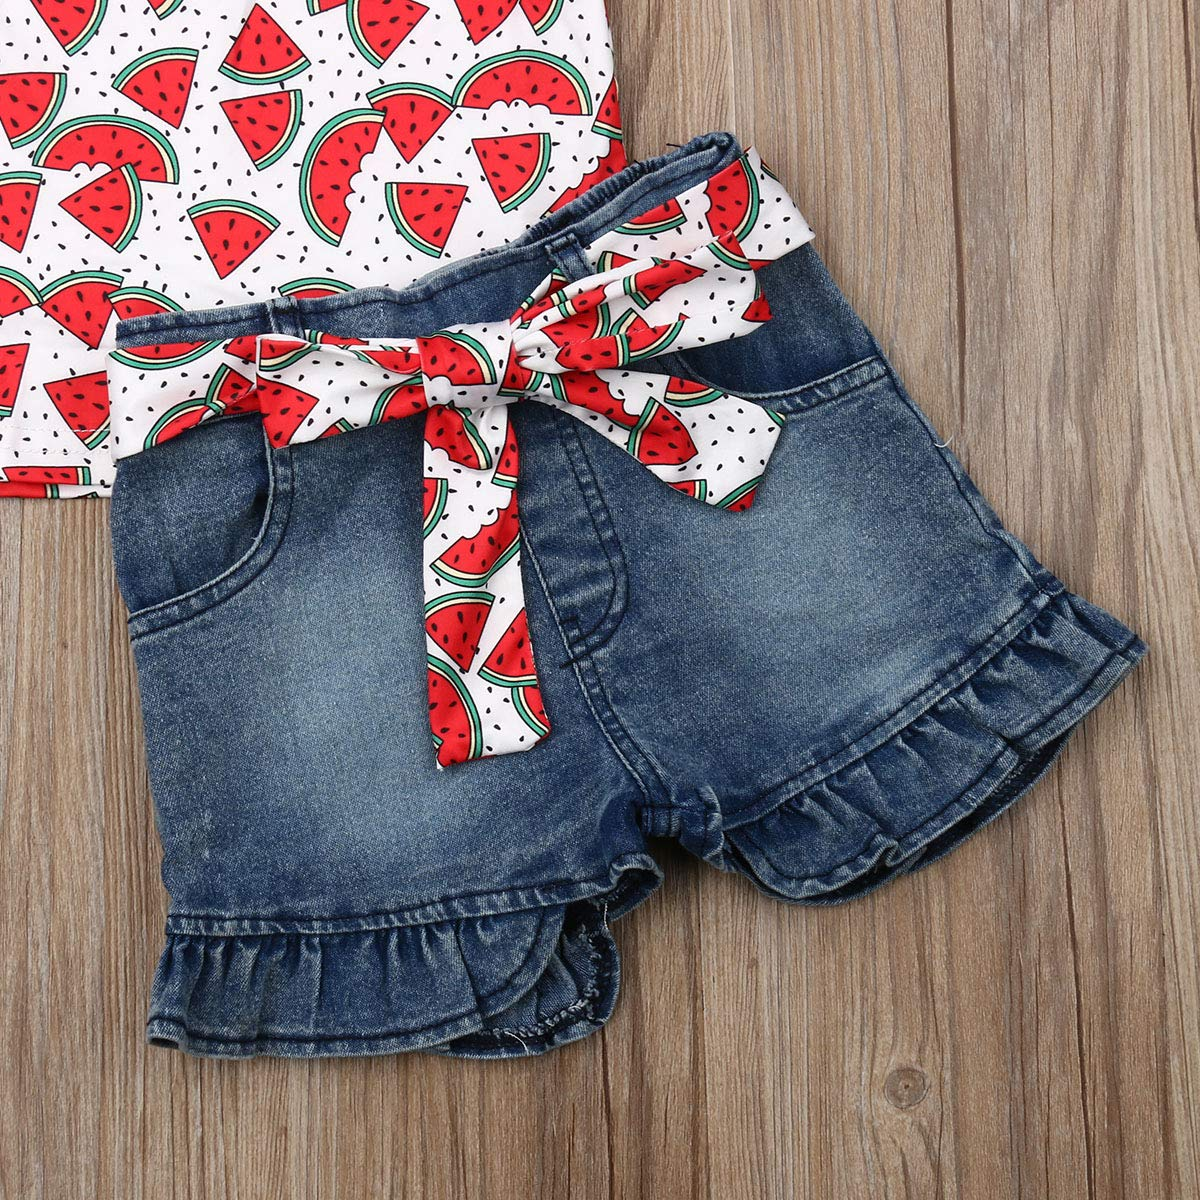 Baby Little Girls Denim Shorts Set Fly Sleeve Watermelon or Flamingo Tops+Denim Jean Short+Sash Outfits Set 1-6Y